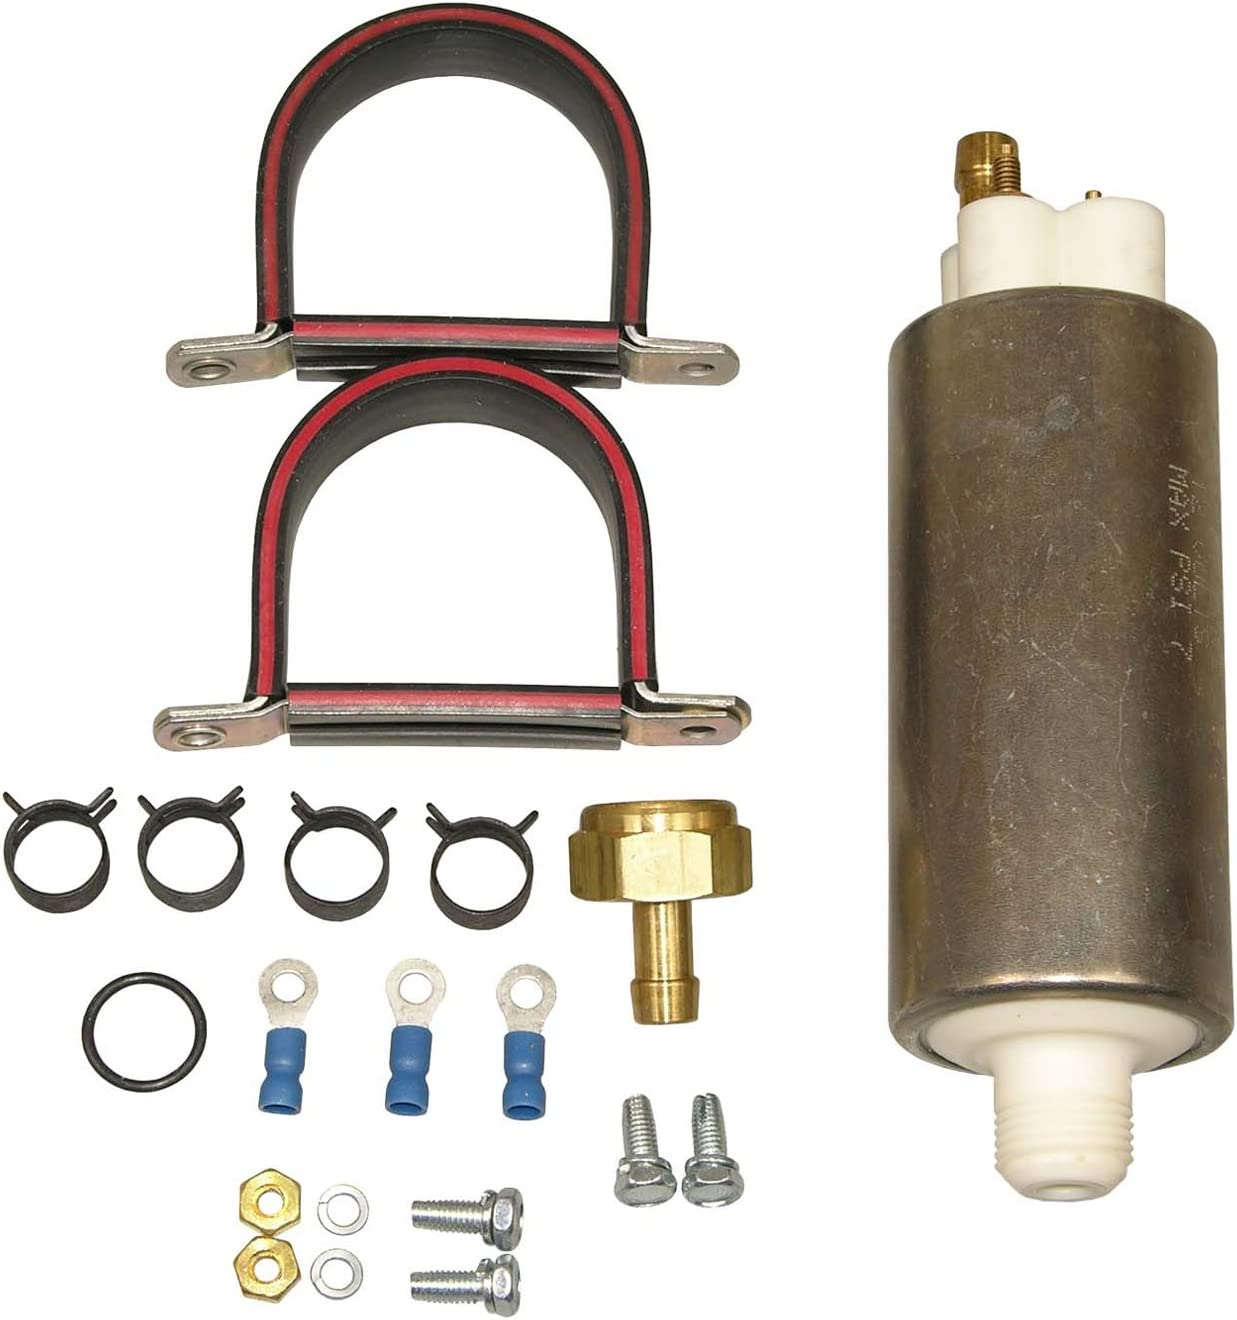 Airtex E8004 Electric Fuel Pump